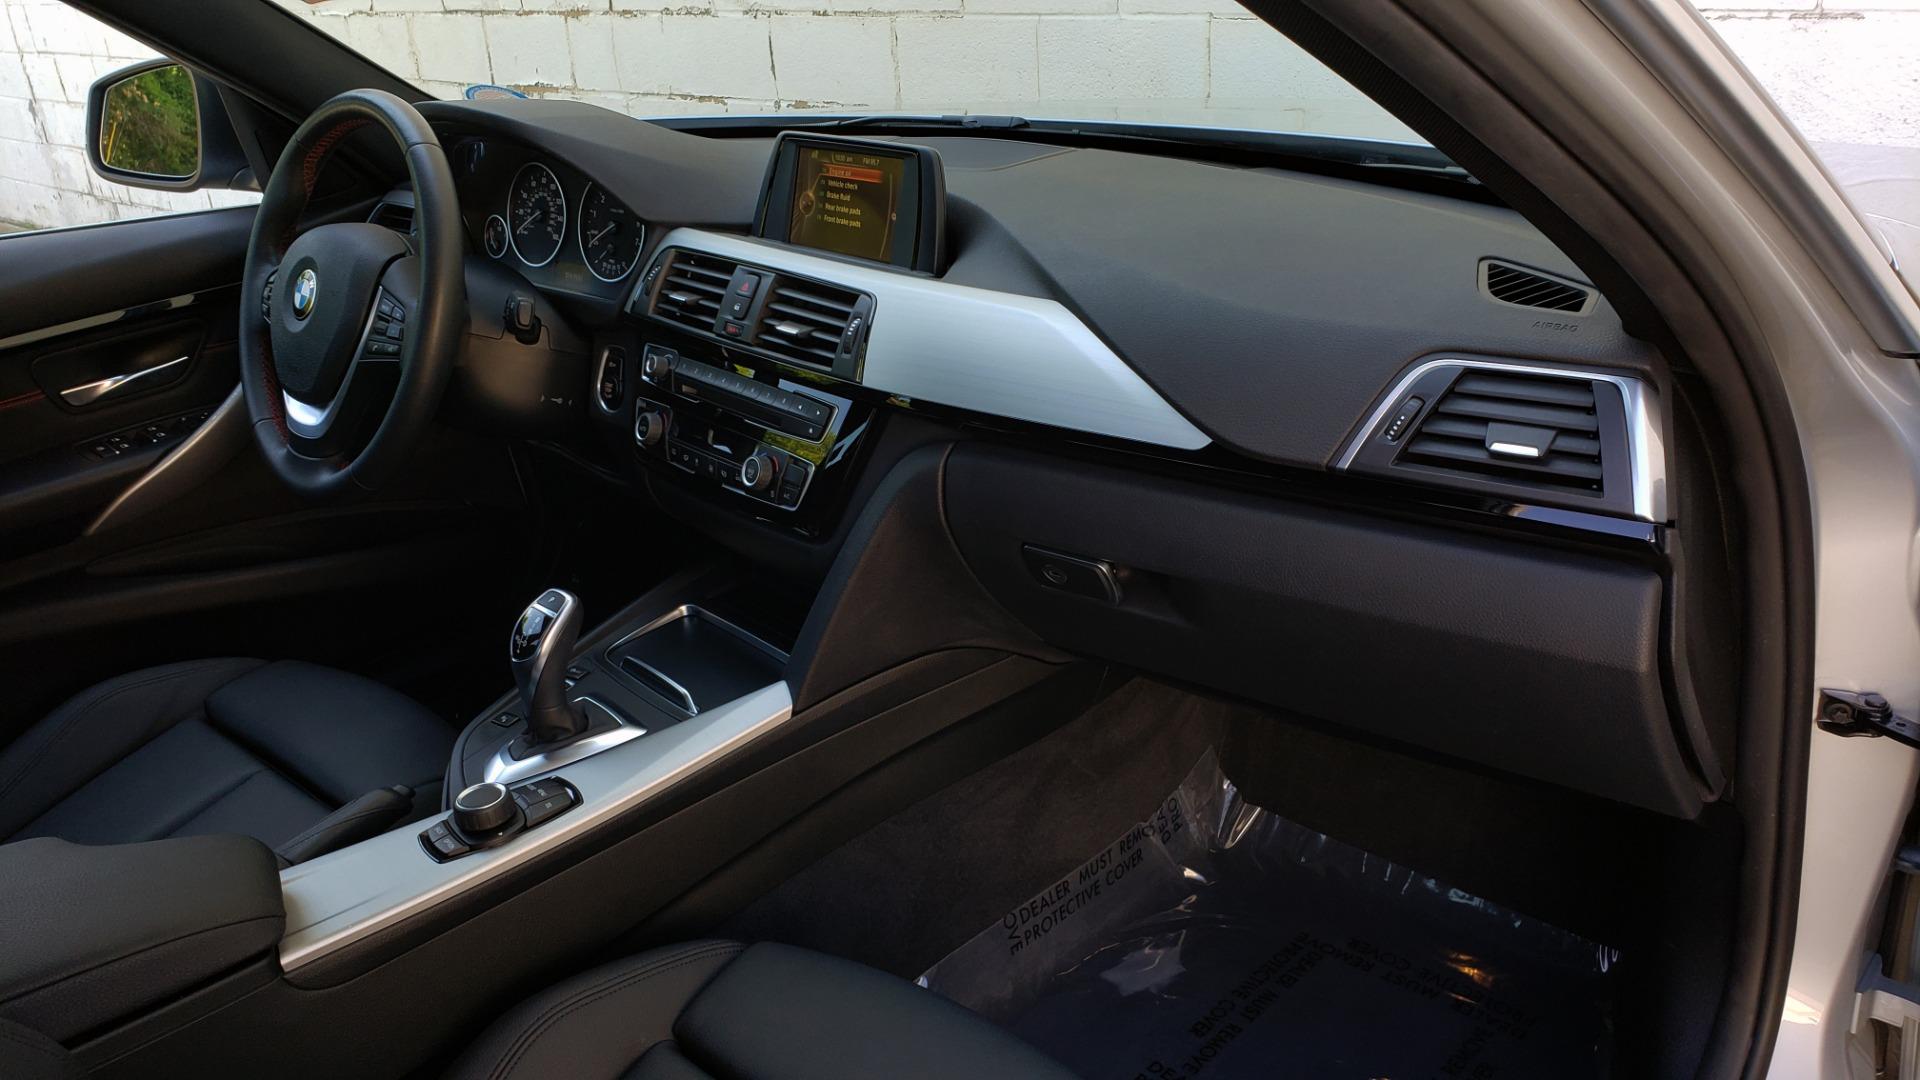 Used 2017 BMW 3 SERIES 330I SPORT SEDAN / DRVR ASST PKG / SUNROOF / REARVIEW for sale Sold at Formula Imports in Charlotte NC 28227 67